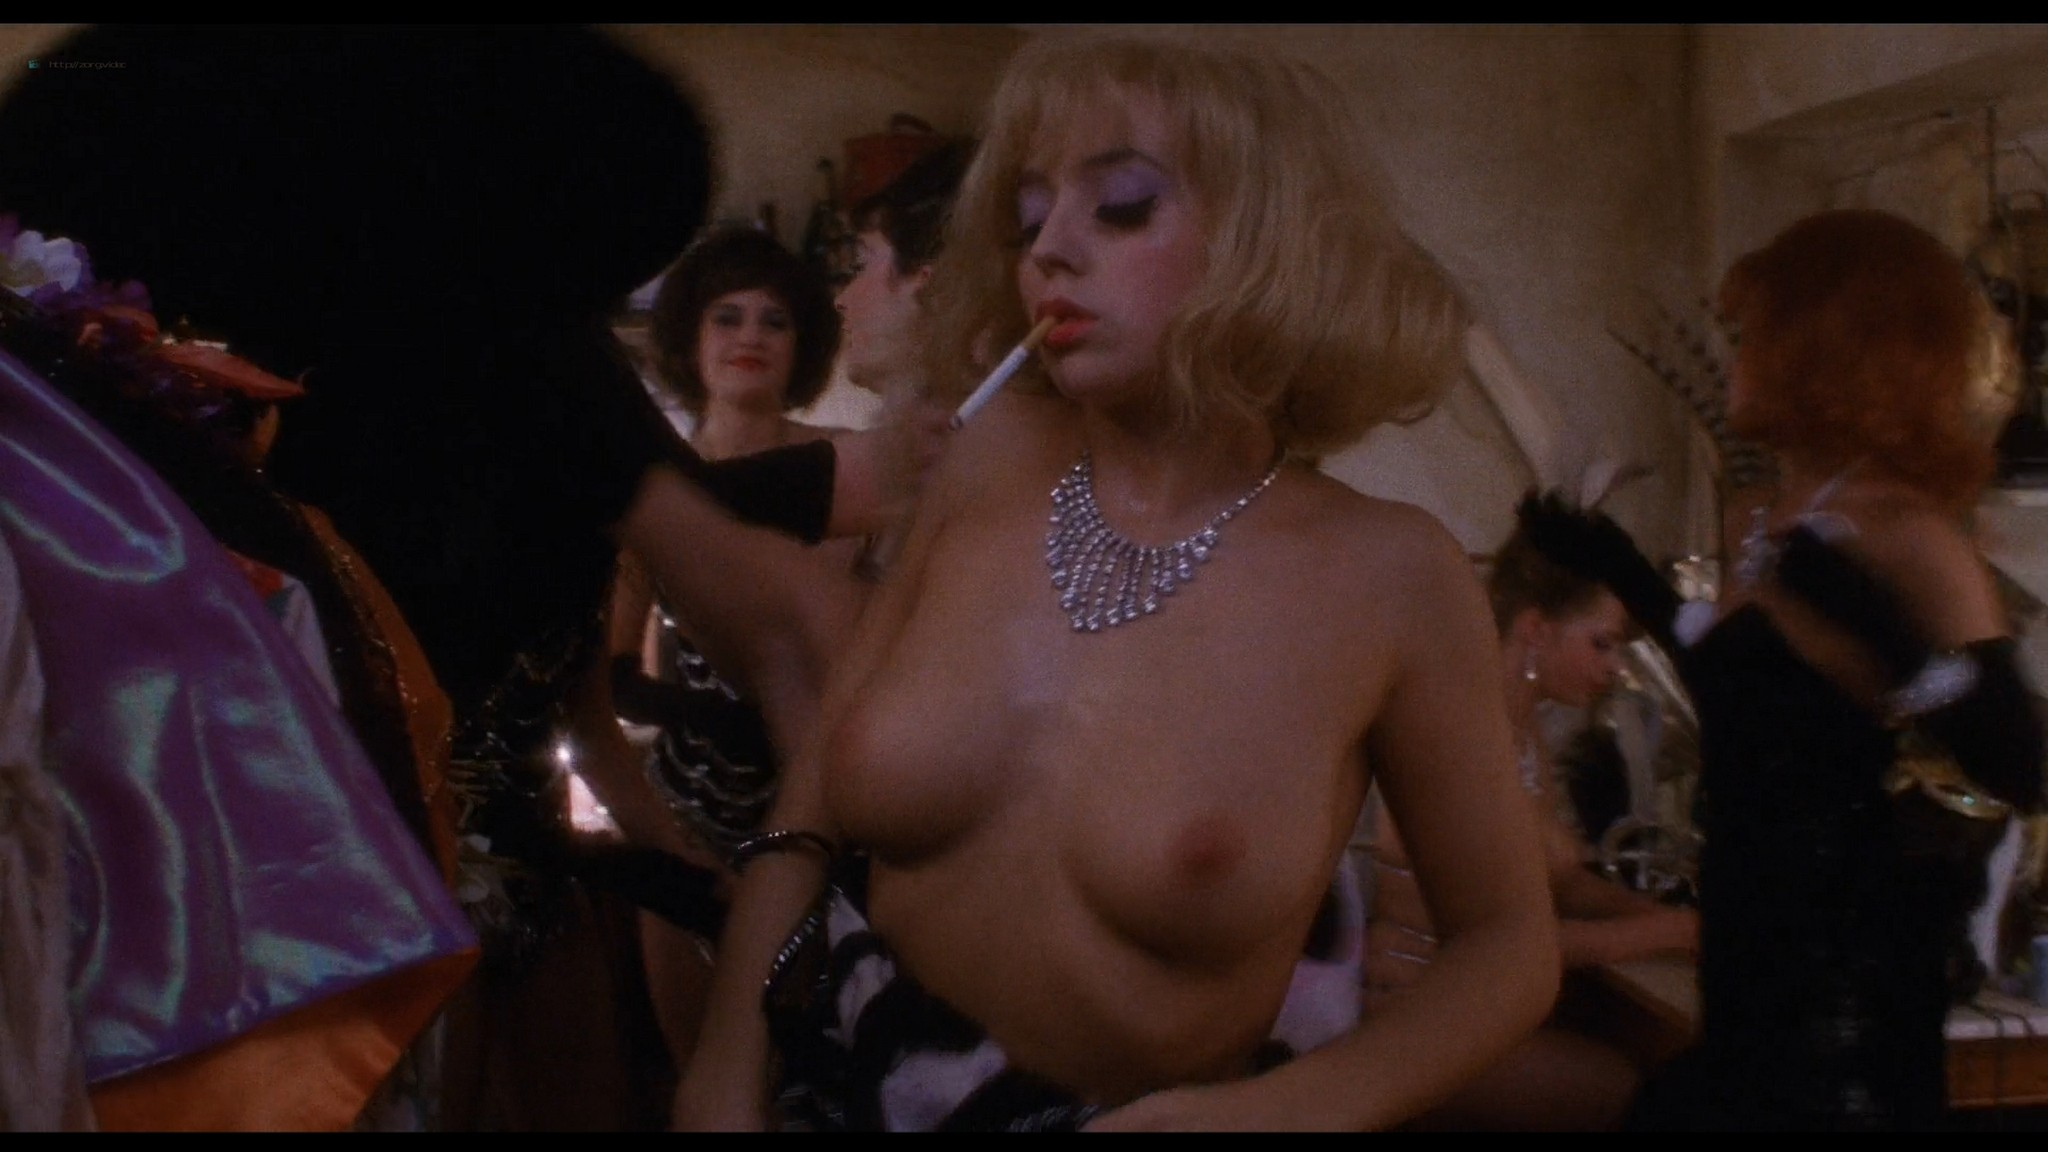 Bridget Fonda nude butt boobs Britt Ekland nude Joanne Whalley hot - Scandal (1989) HD 1080p BluRay (18)